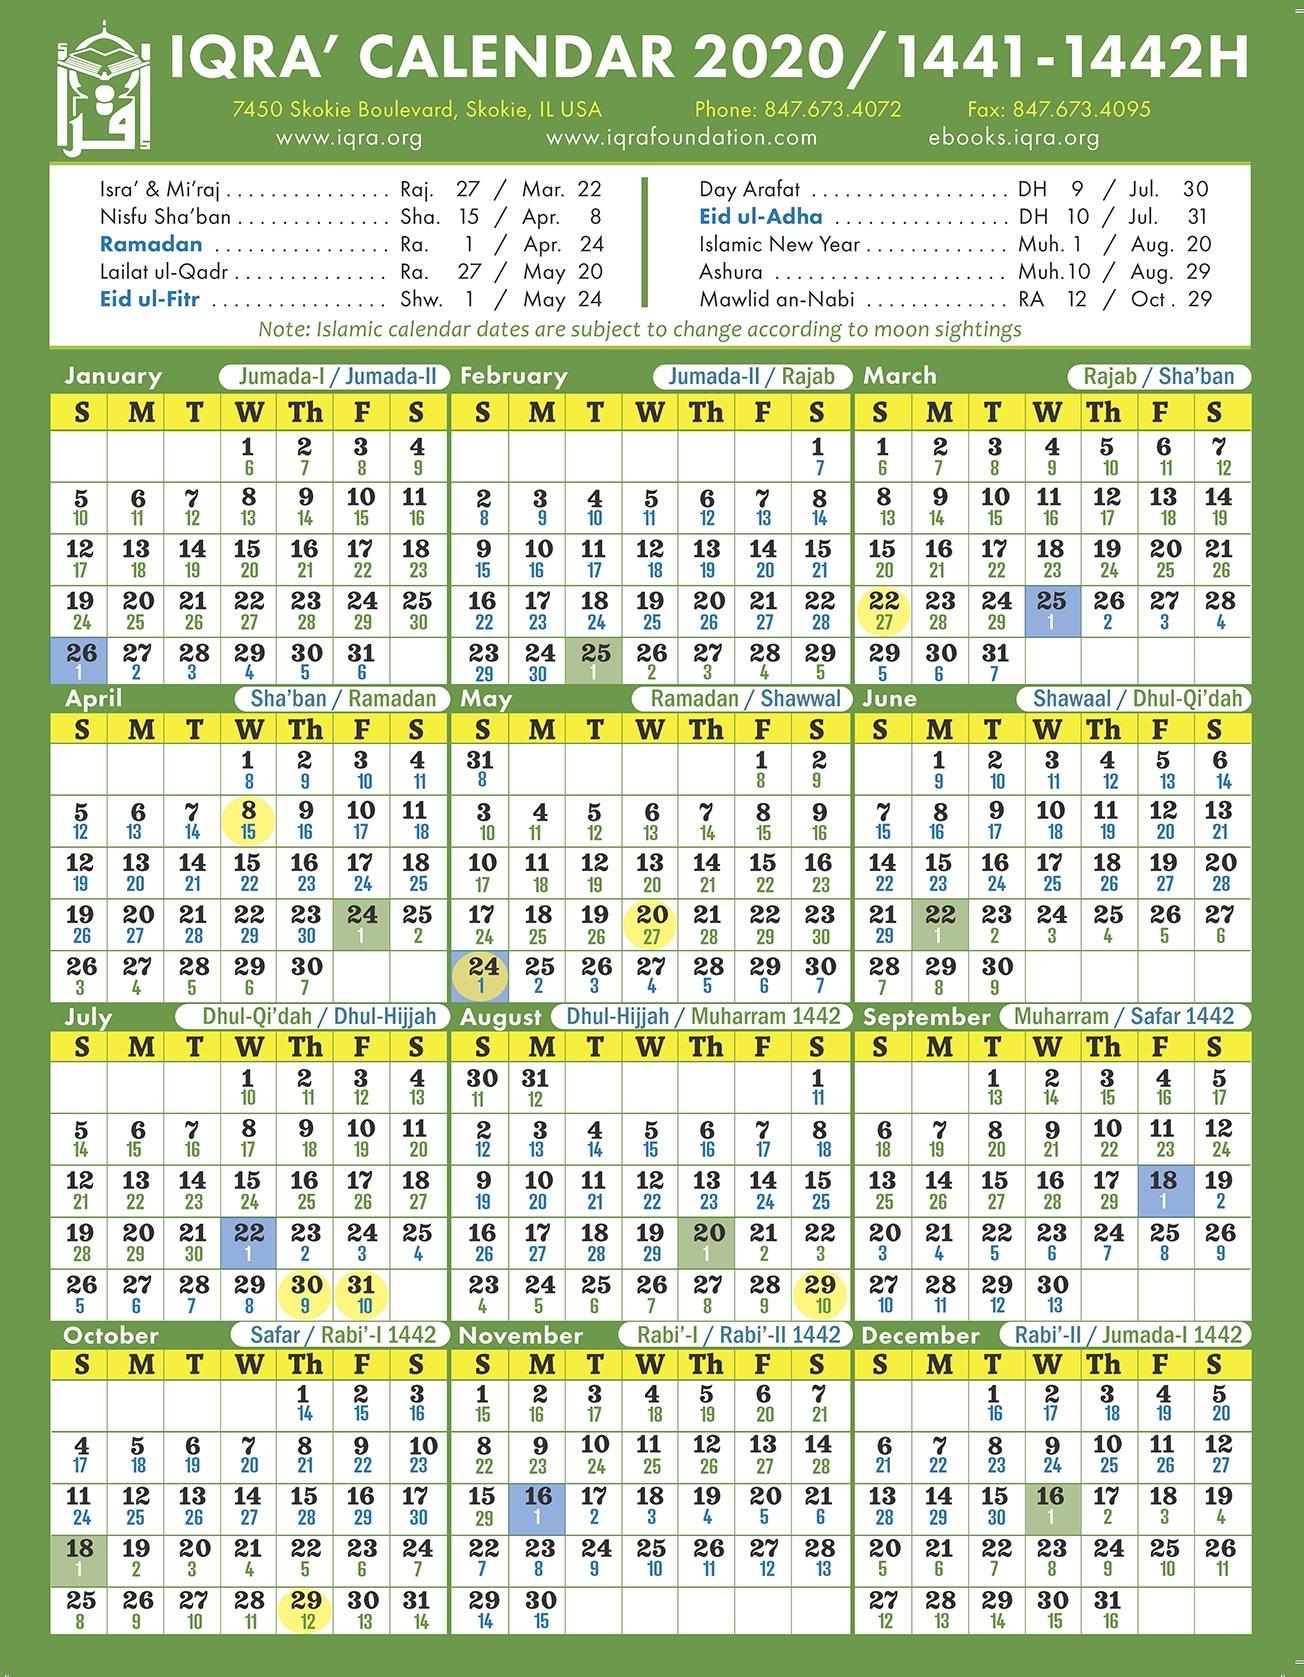 Iqra' Calendar 2020 / 1441-1442H Islamic Dates